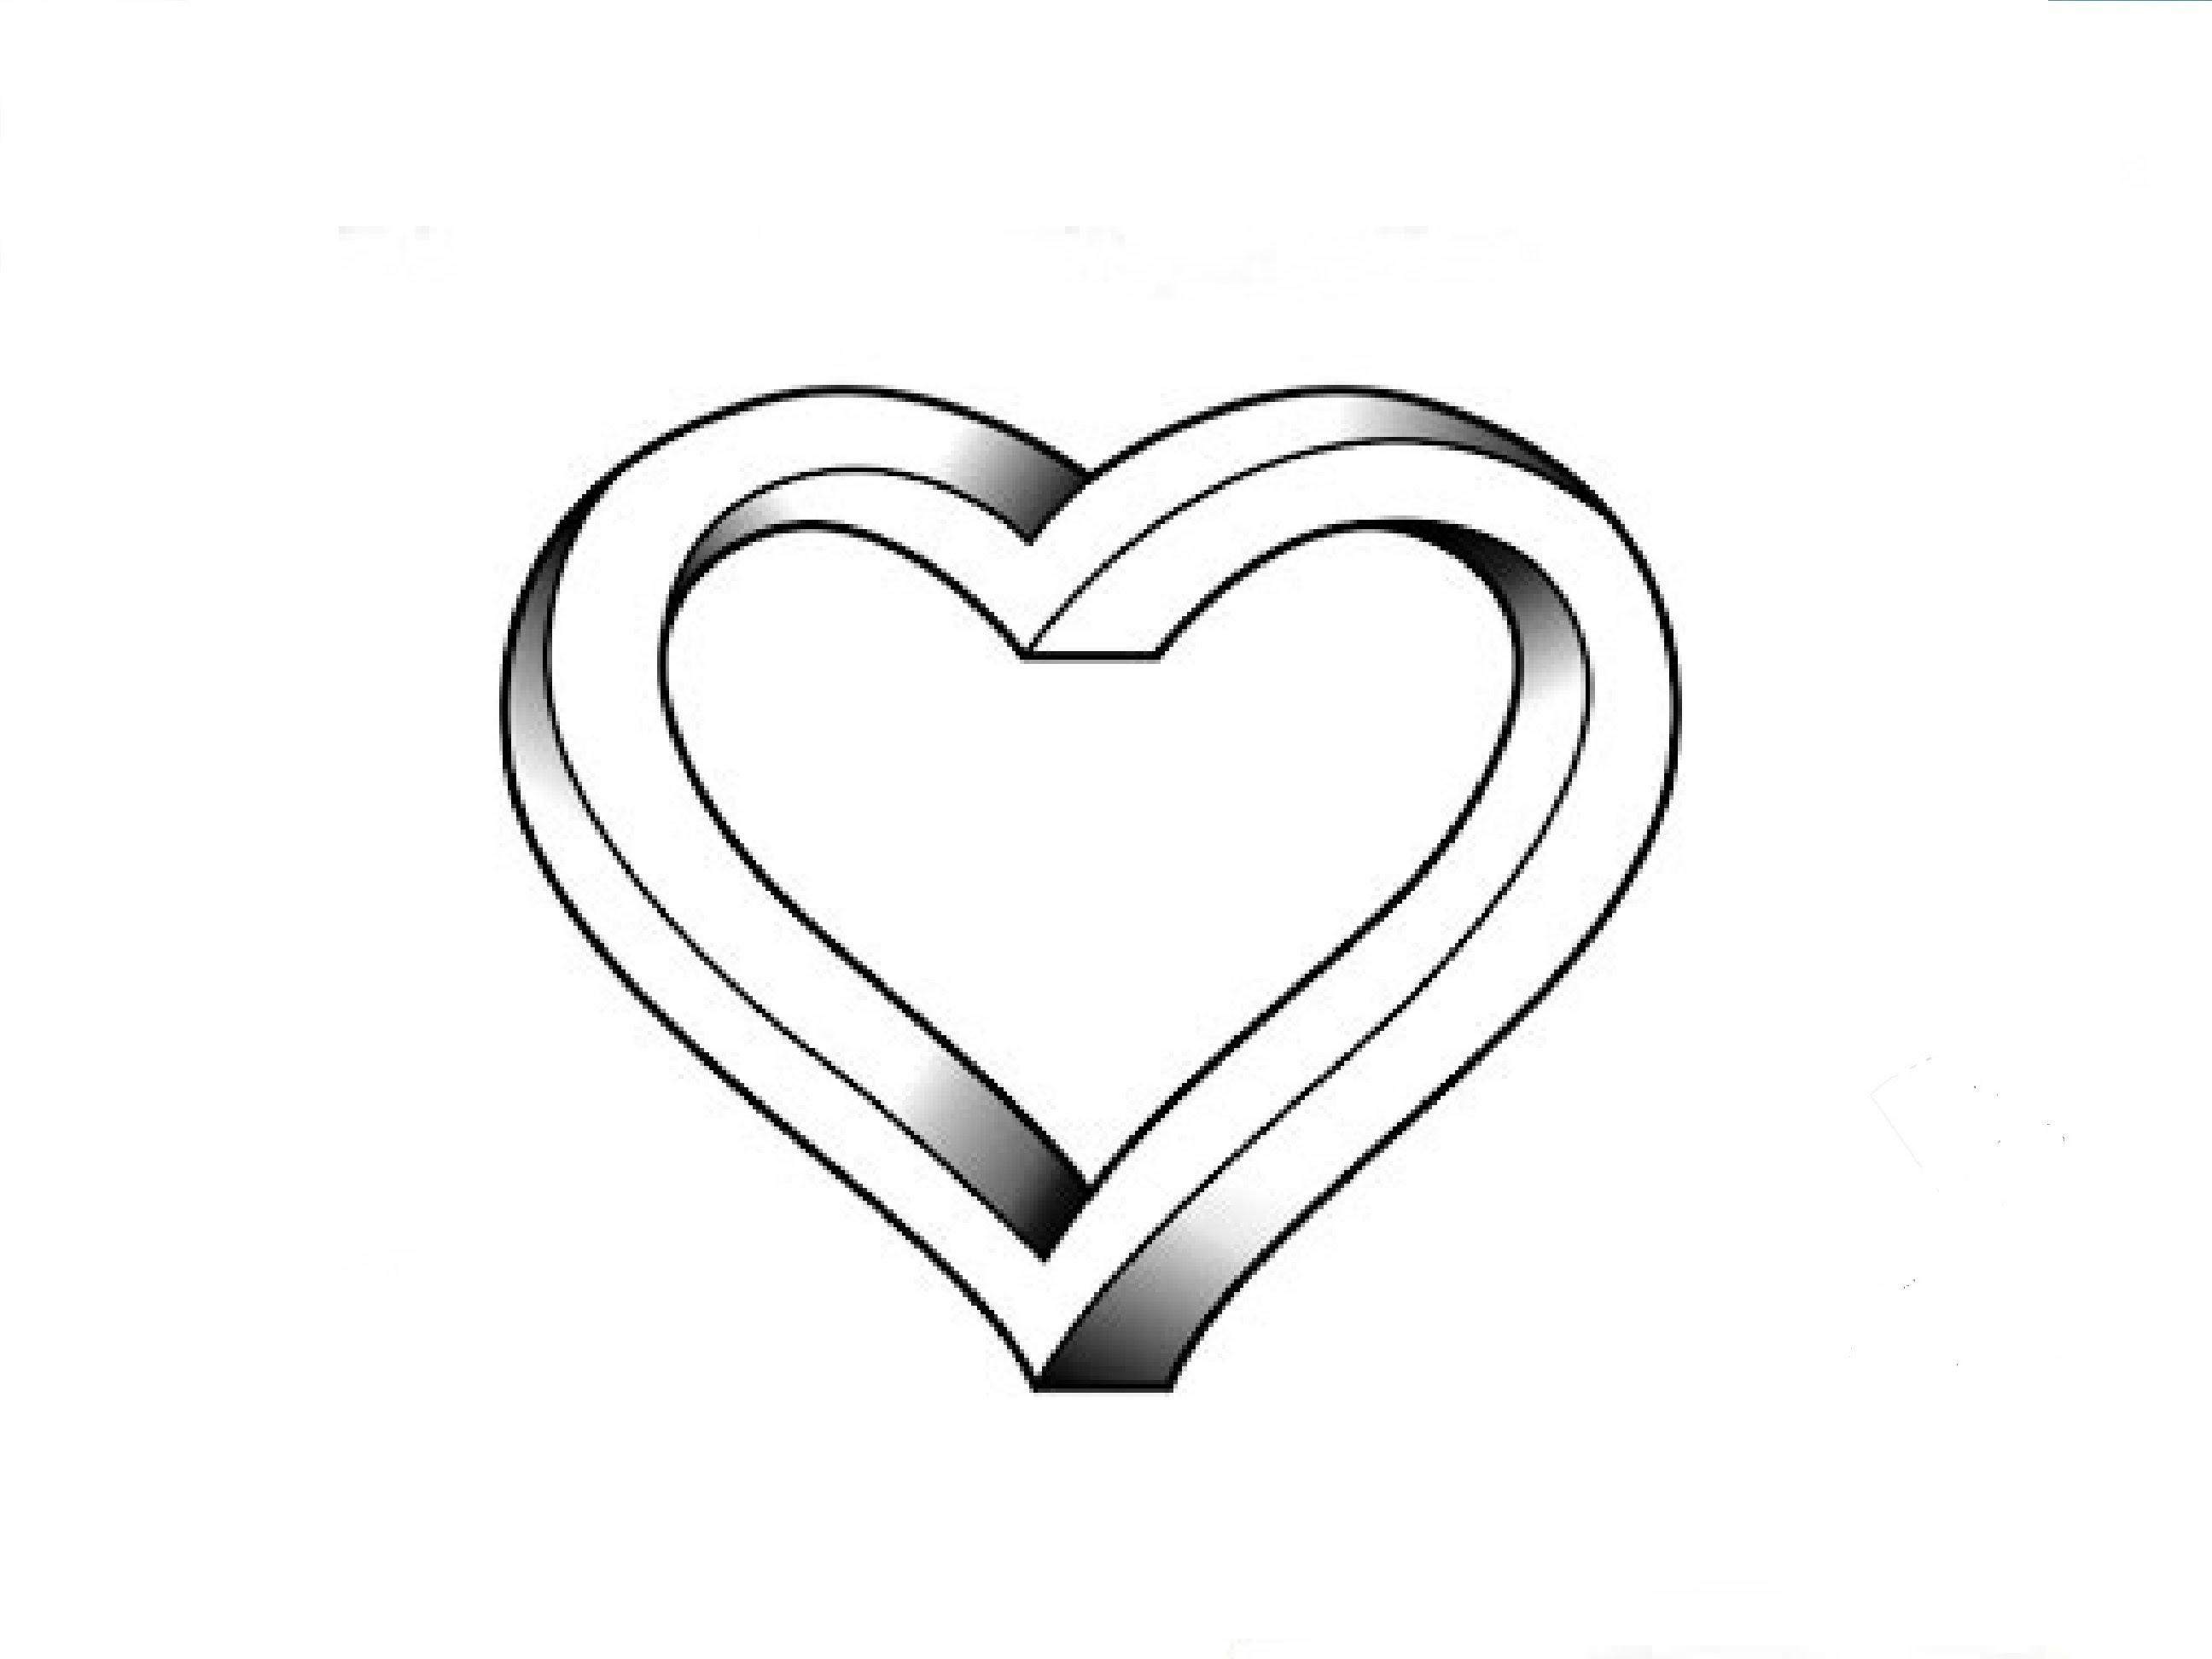 Love Heart Drawings